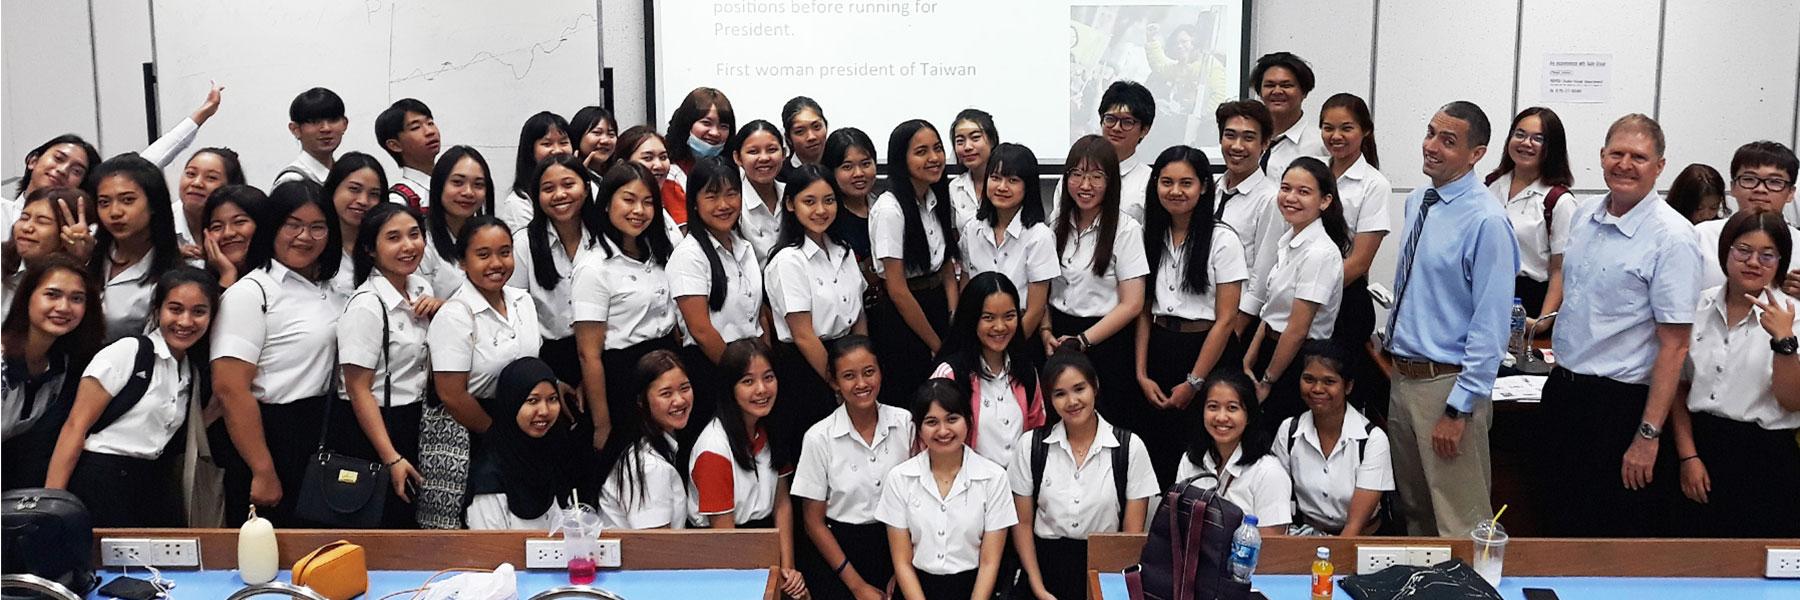 Taiwan Alumni Friends | Taiwan Scholarship | Dr Steven A Martin | Phuket Thailand Teaching